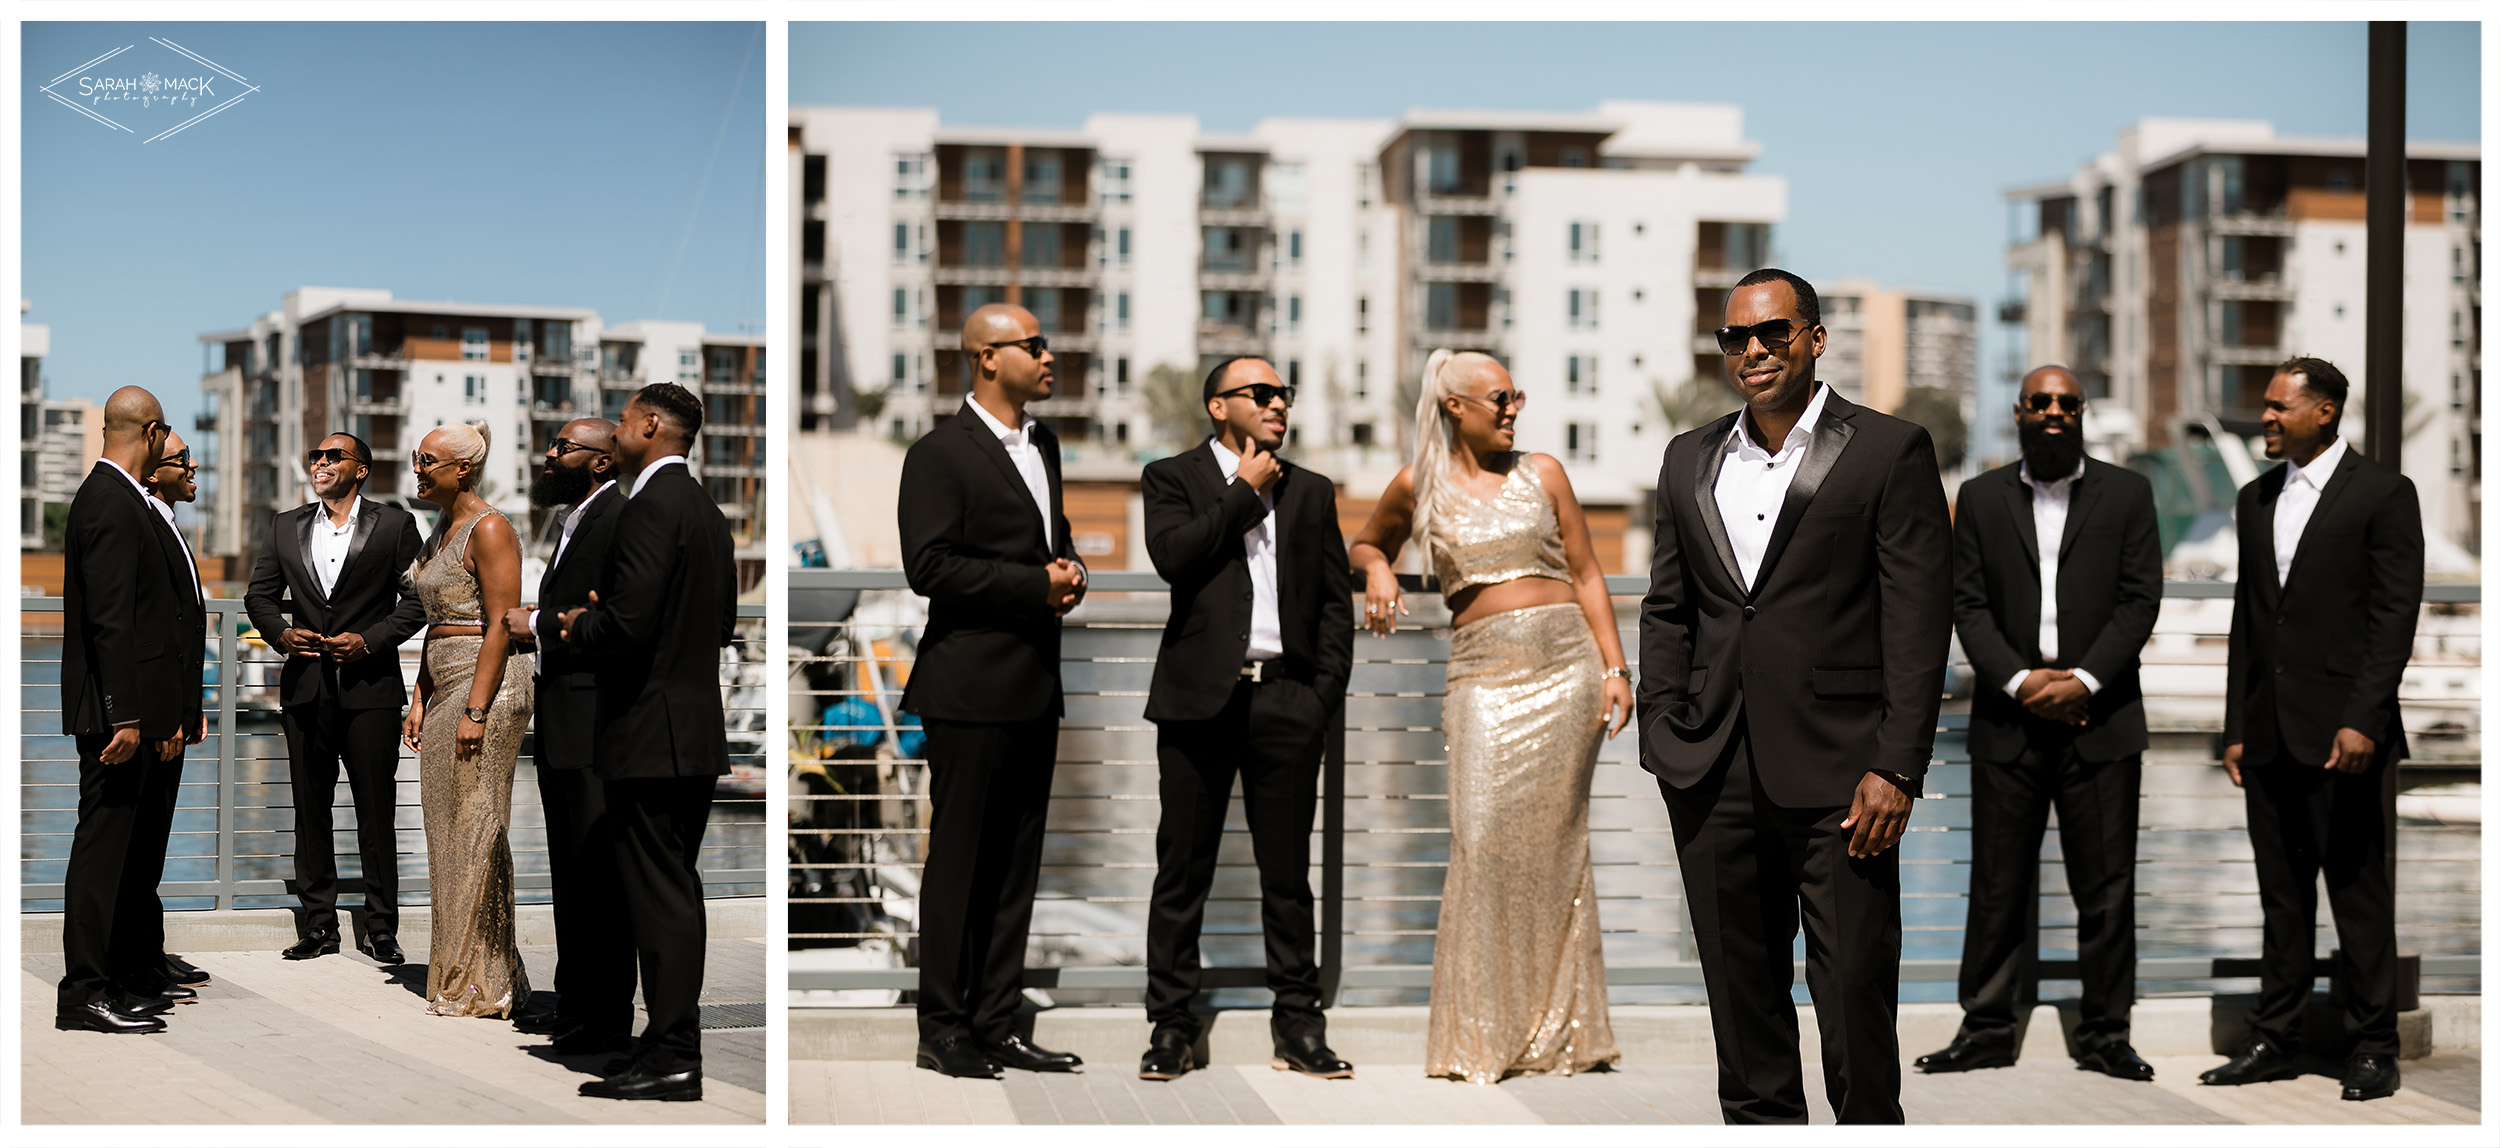 MK-Santa-Monica-Catholic-Church-Wedding-Photography-18.jpg